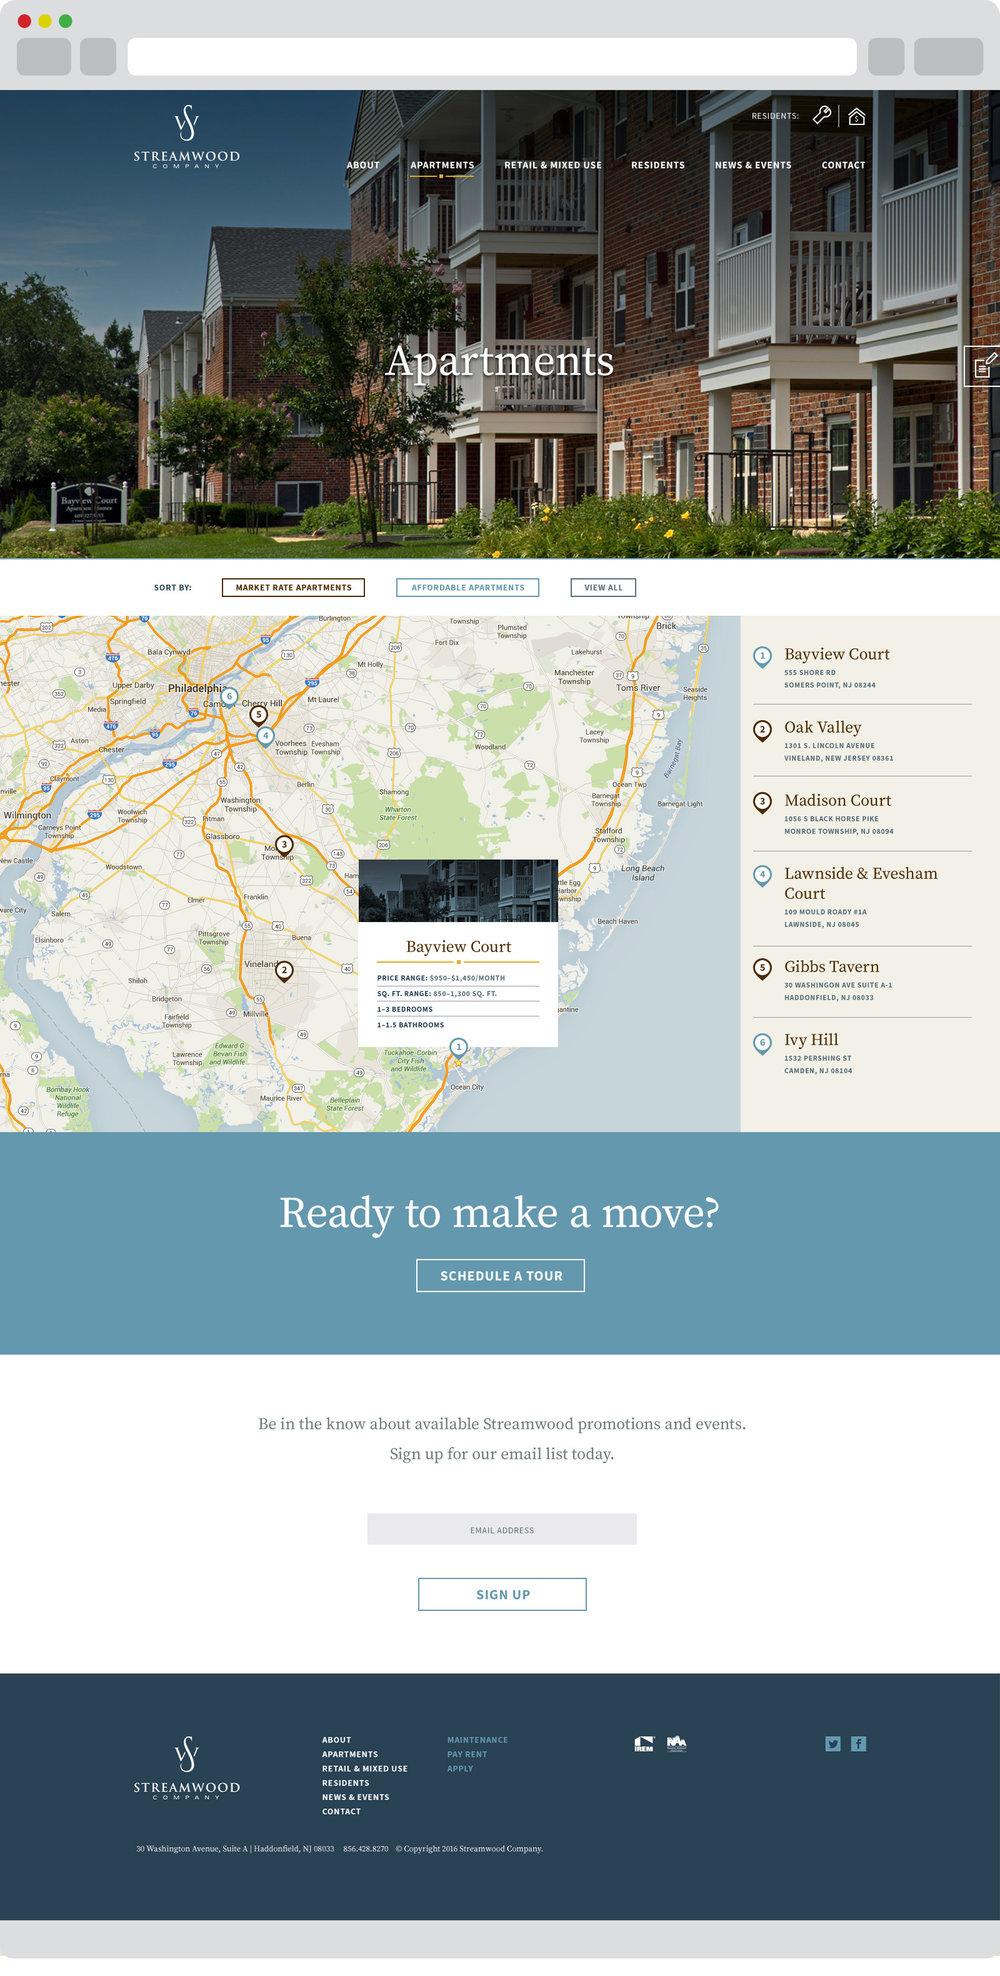 julierado-streamwood-apartment-landing-flat-browser-mockup-fs.jpg